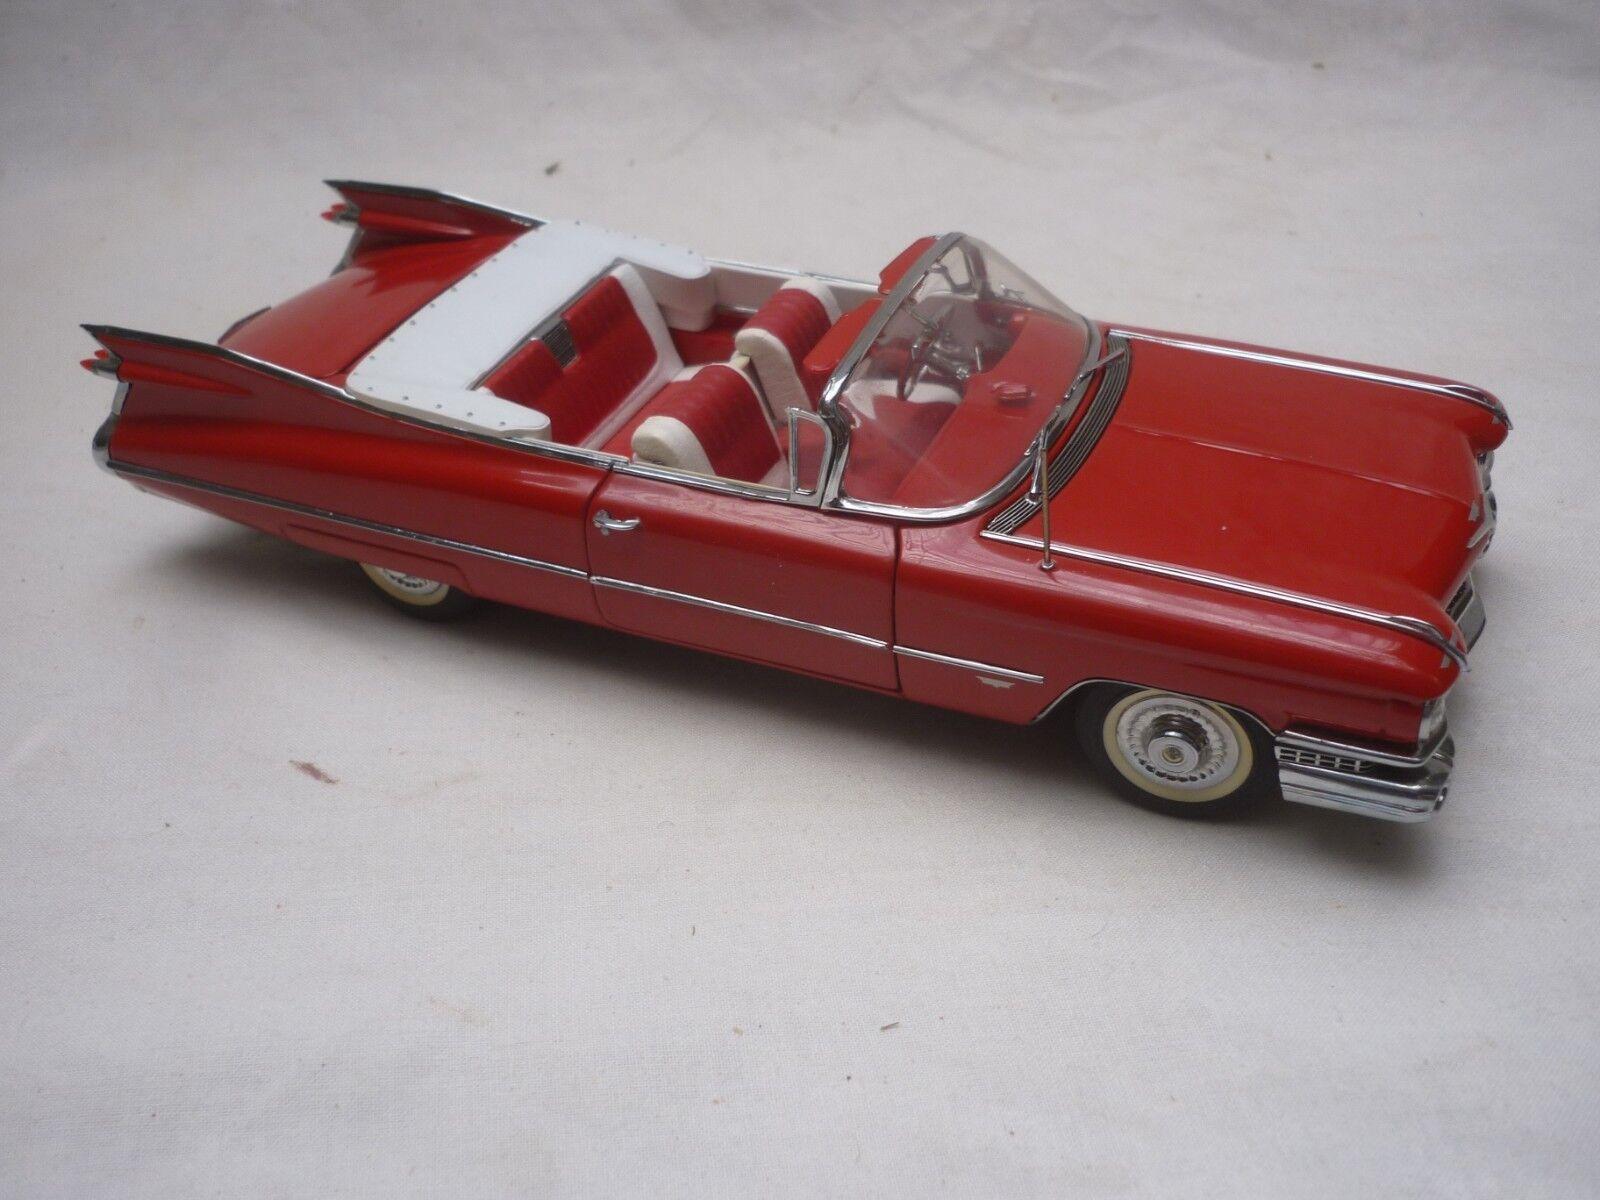 A Danbury mint scale model car of a 1959  Cadillac series 62, no box